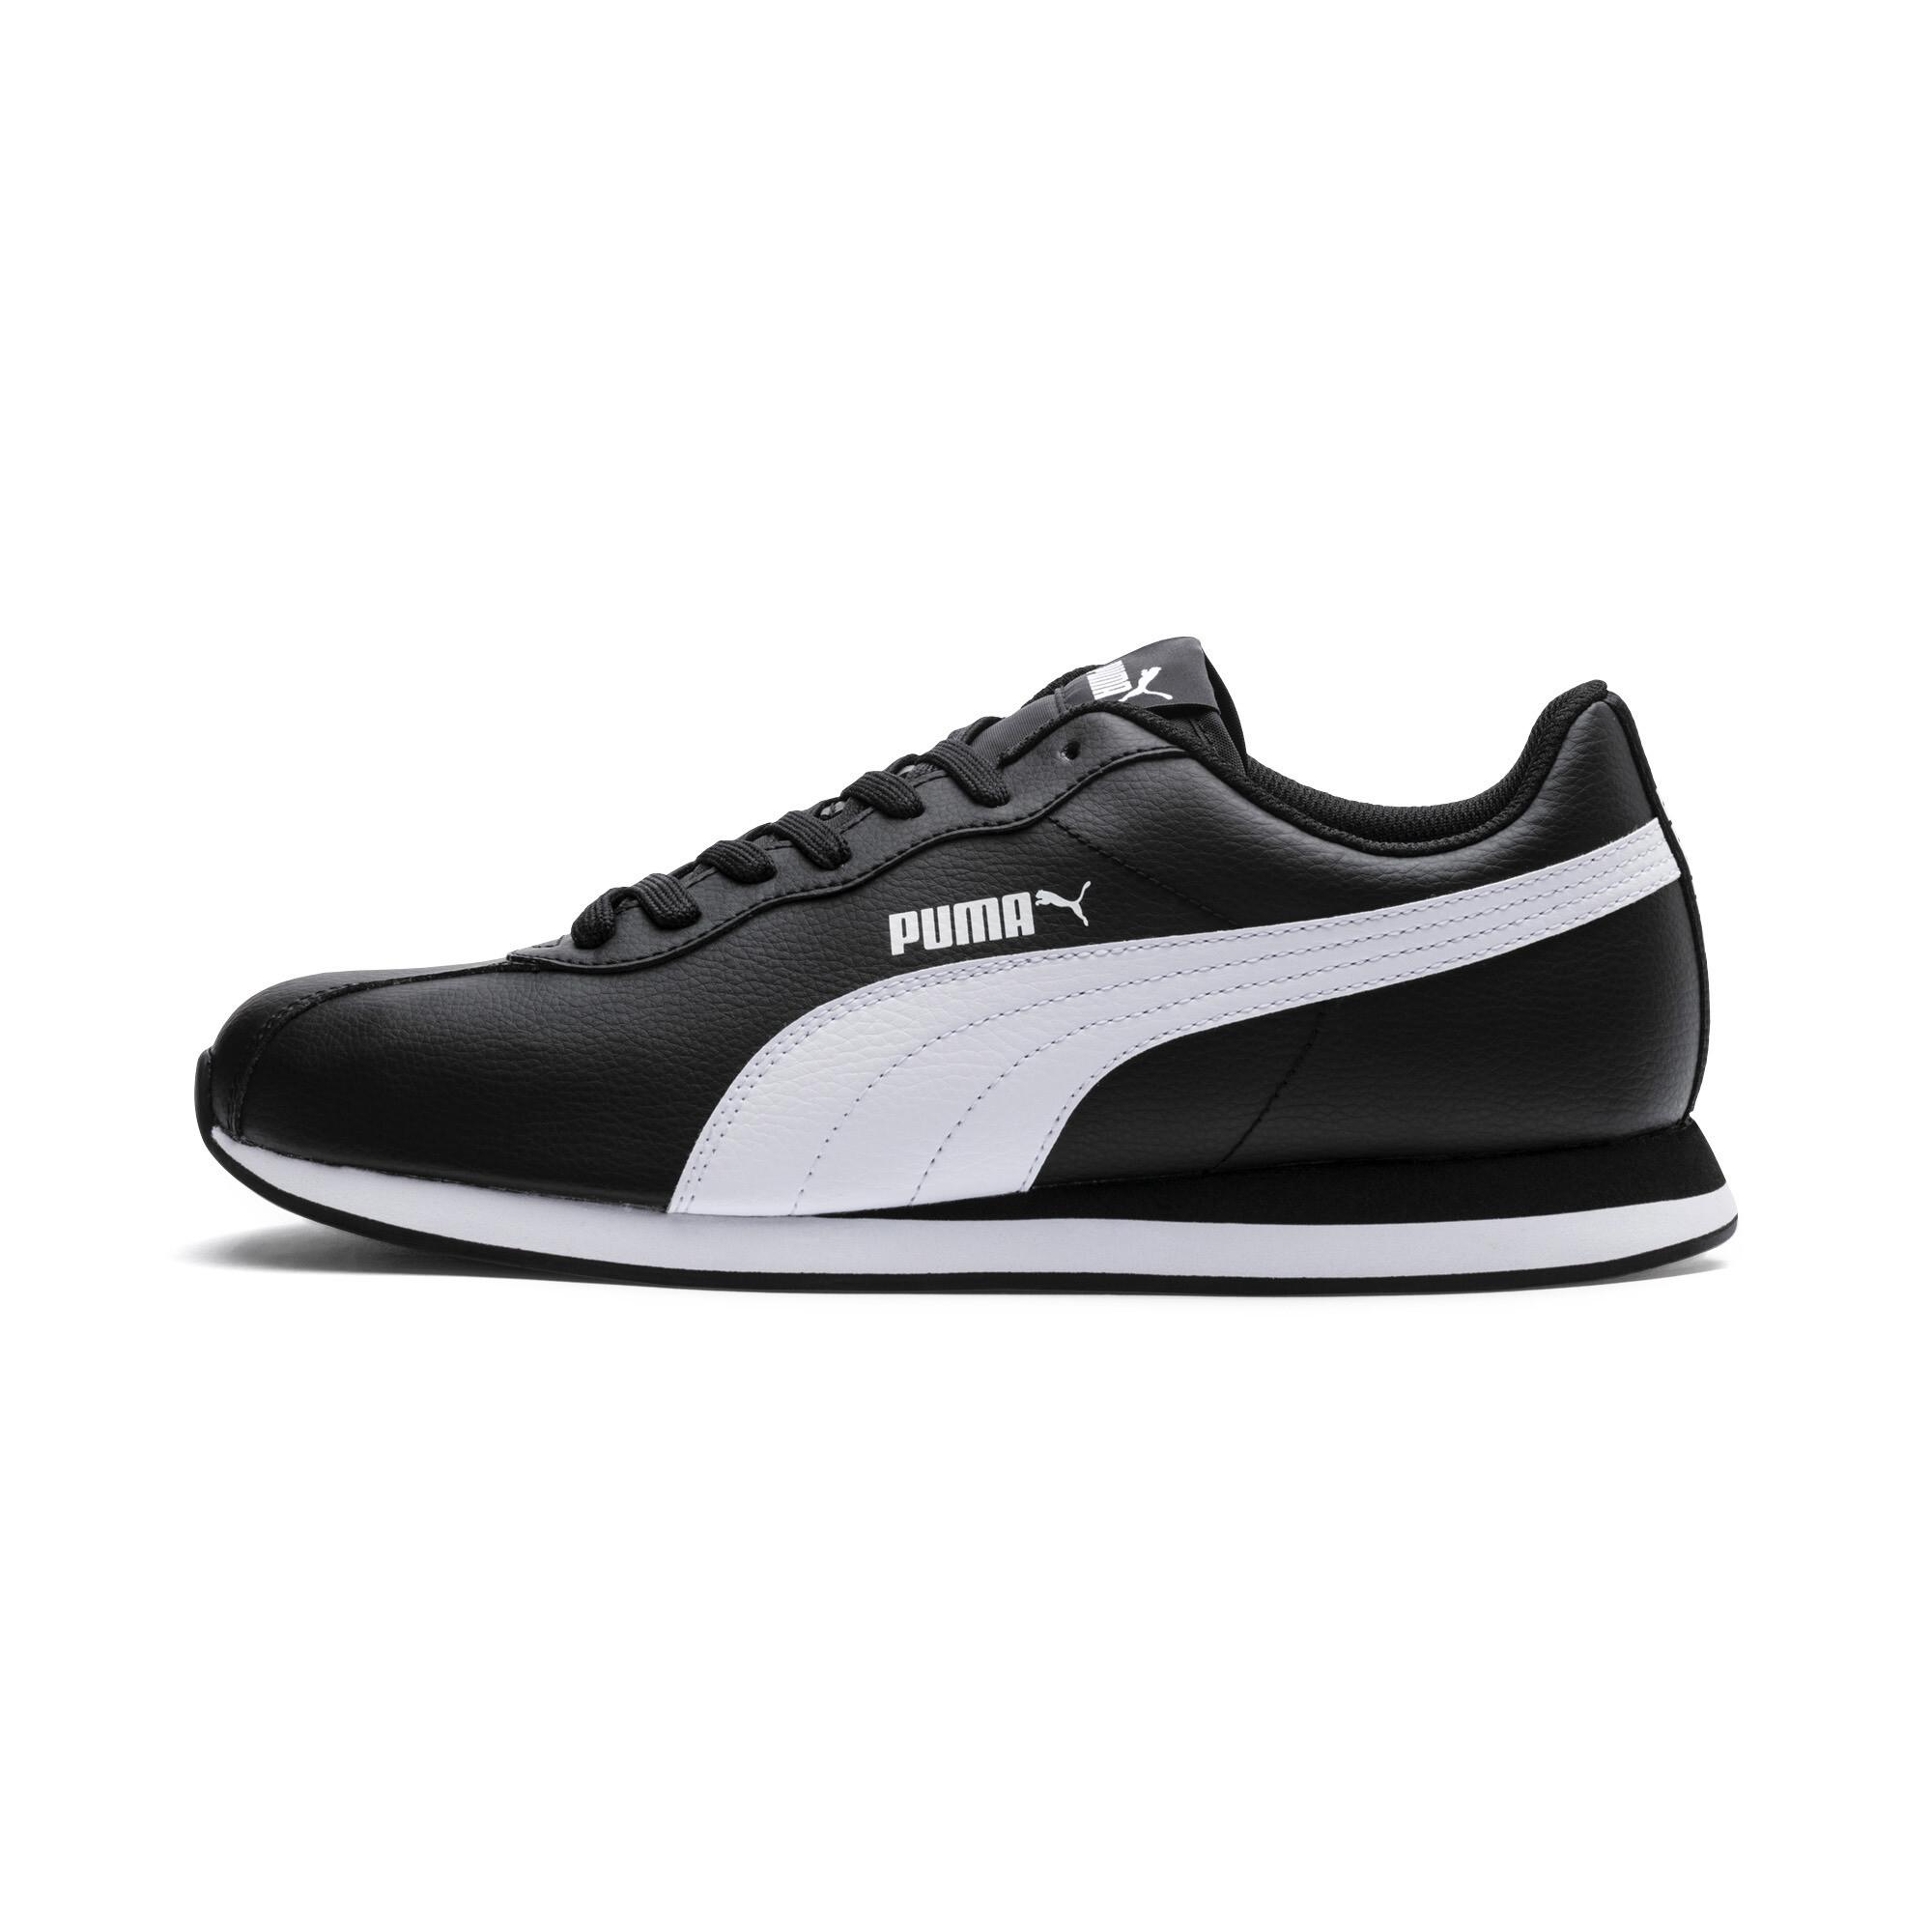 PUMA-Men-039-s-Turin-II-Sneakers thumbnail 36